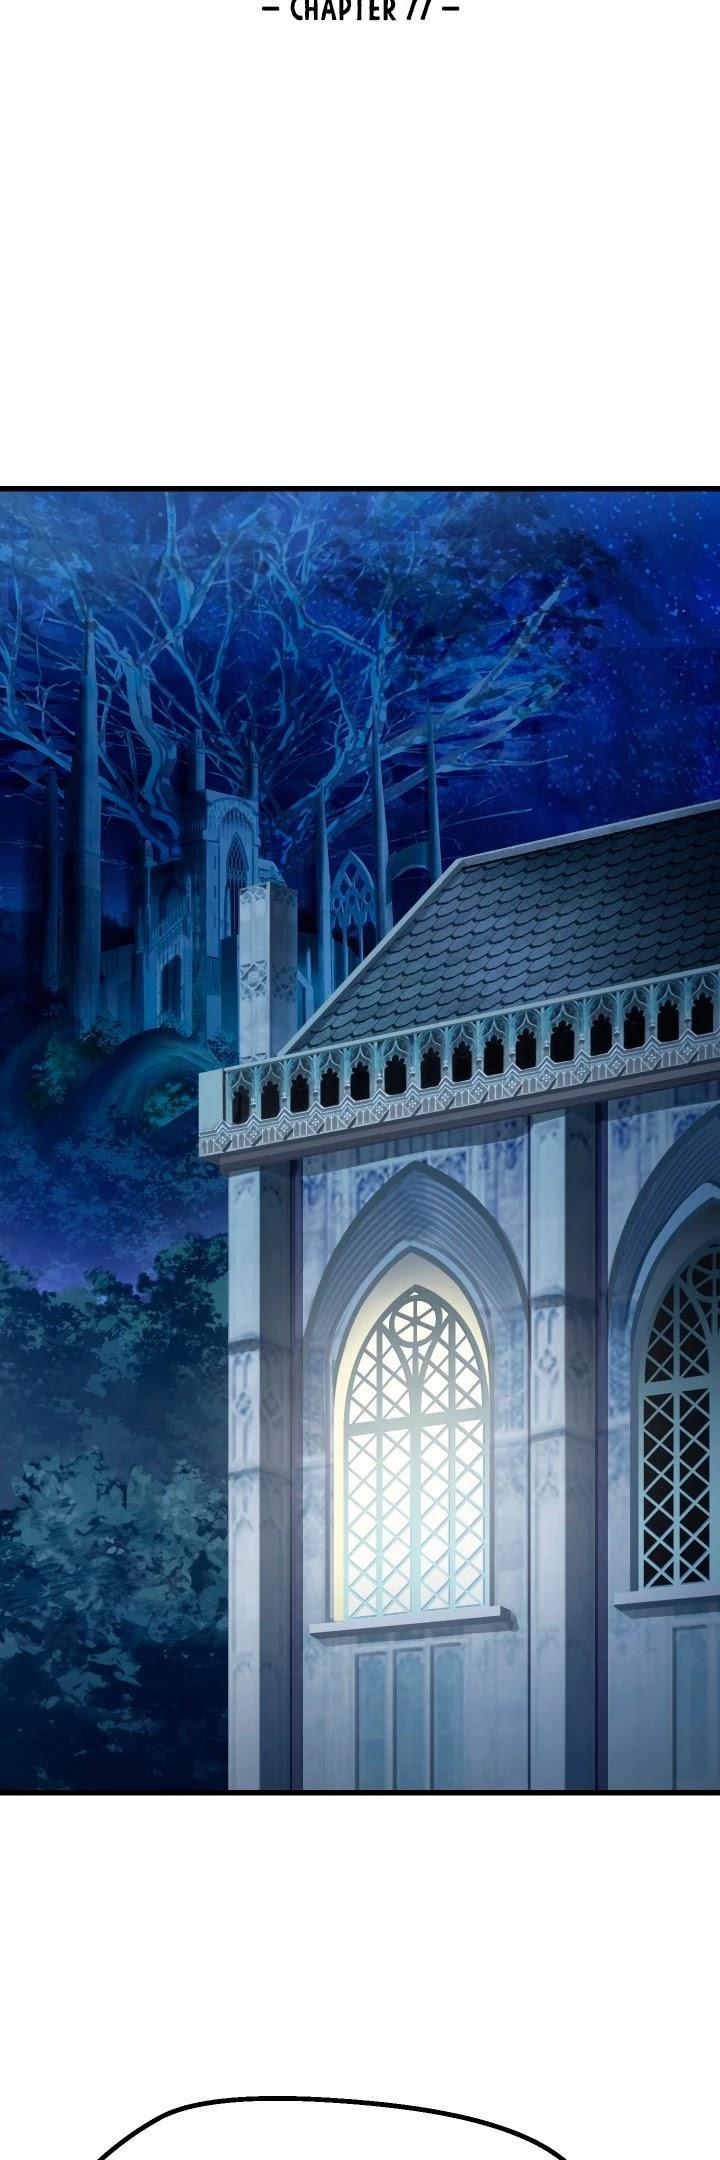 Survival Story Of A Sword King In A Fantasy World Chapter 77 page 22 - Mangakakalots.com